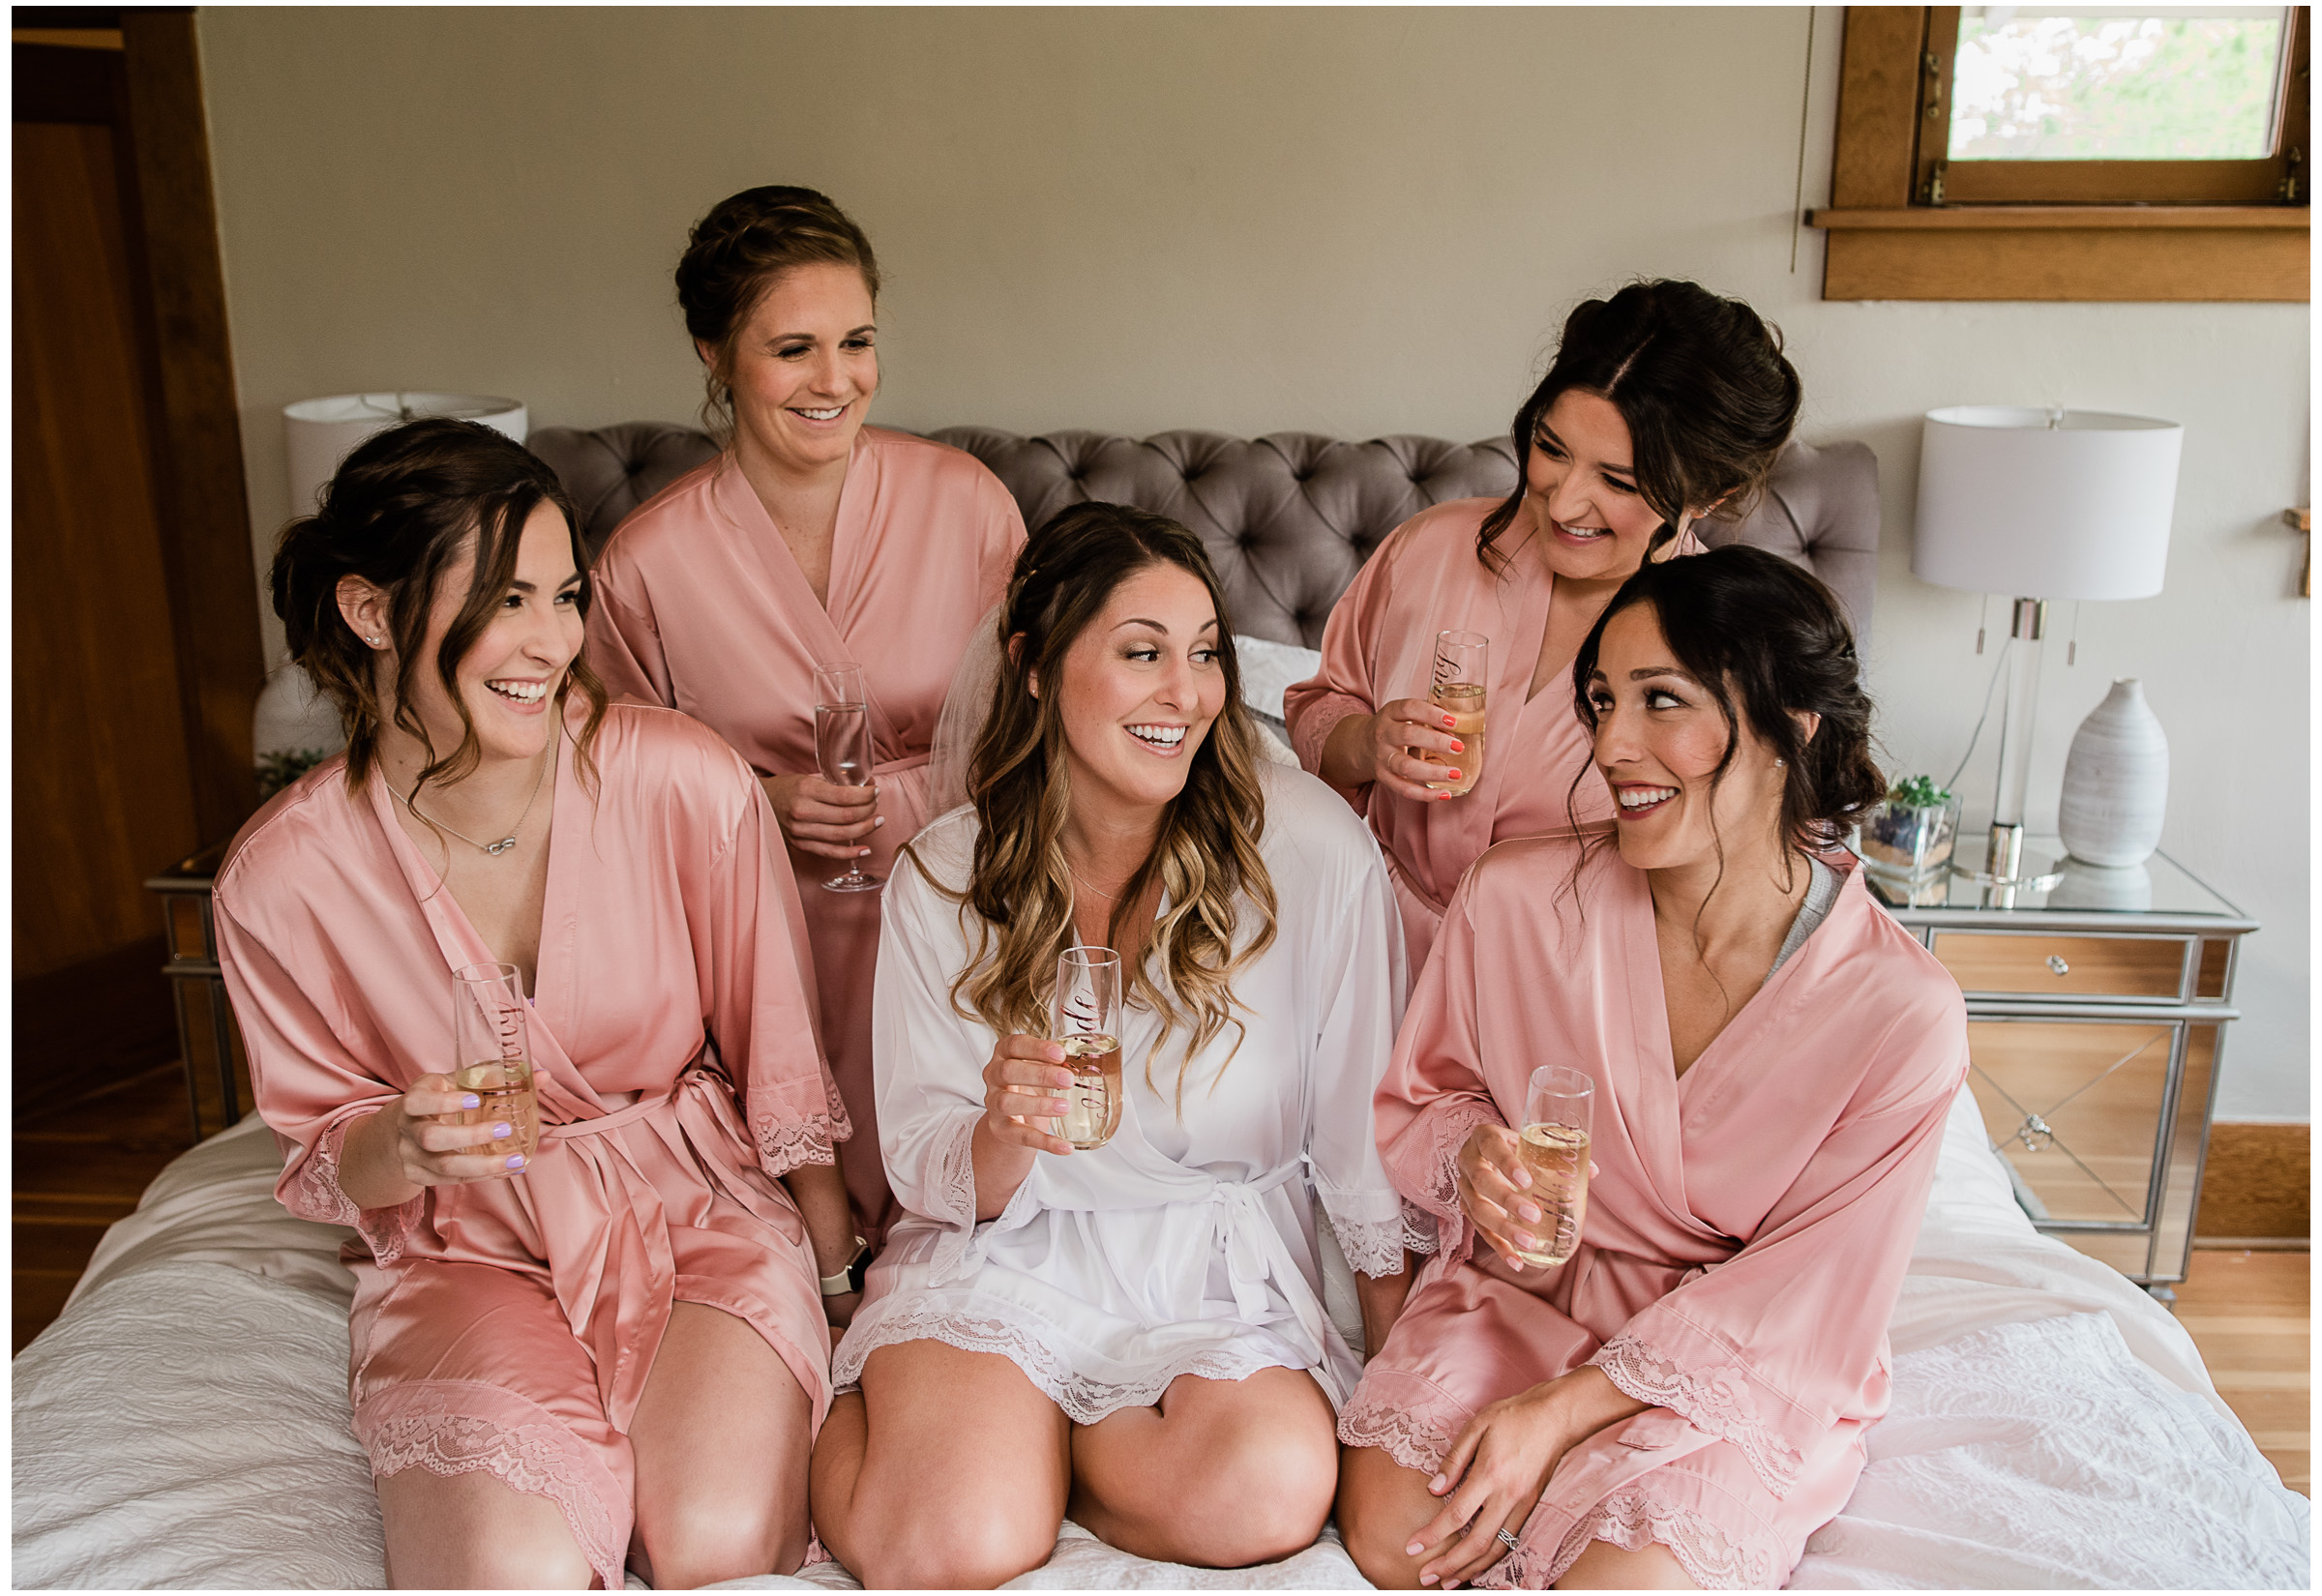 Winters Wedding - Sacramento Photographer - Field & Pond - Justin Wilcox Photography - 5.jpg